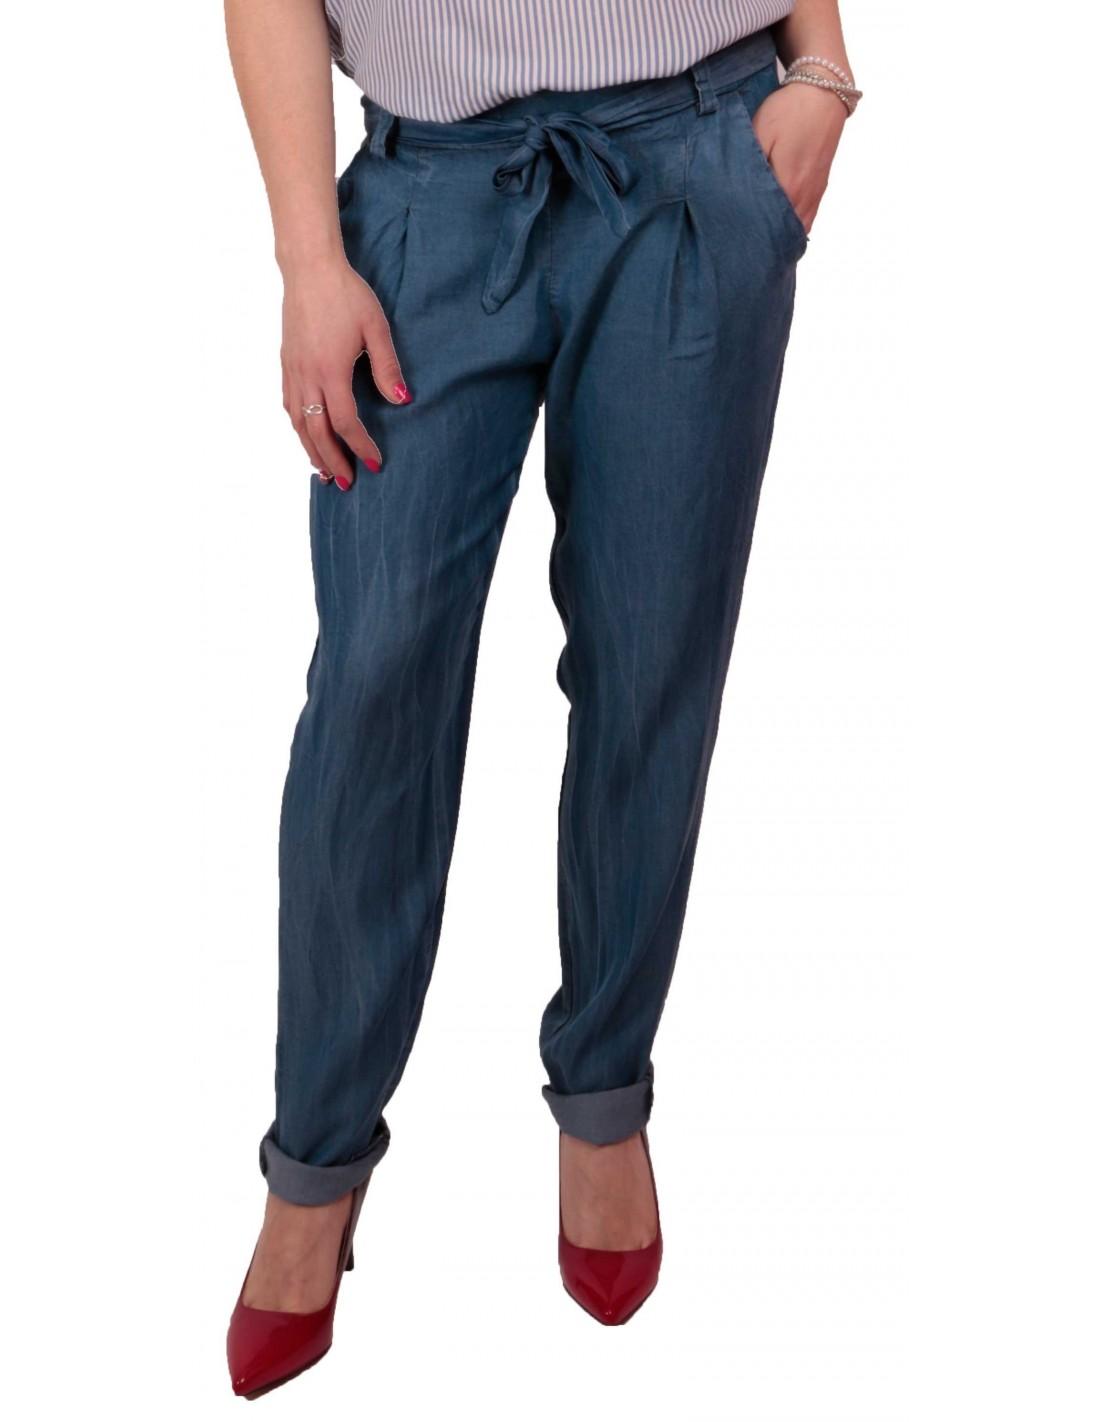 pantalon femme fluide jean brut taille lastique ceinture noeud. Black Bedroom Furniture Sets. Home Design Ideas